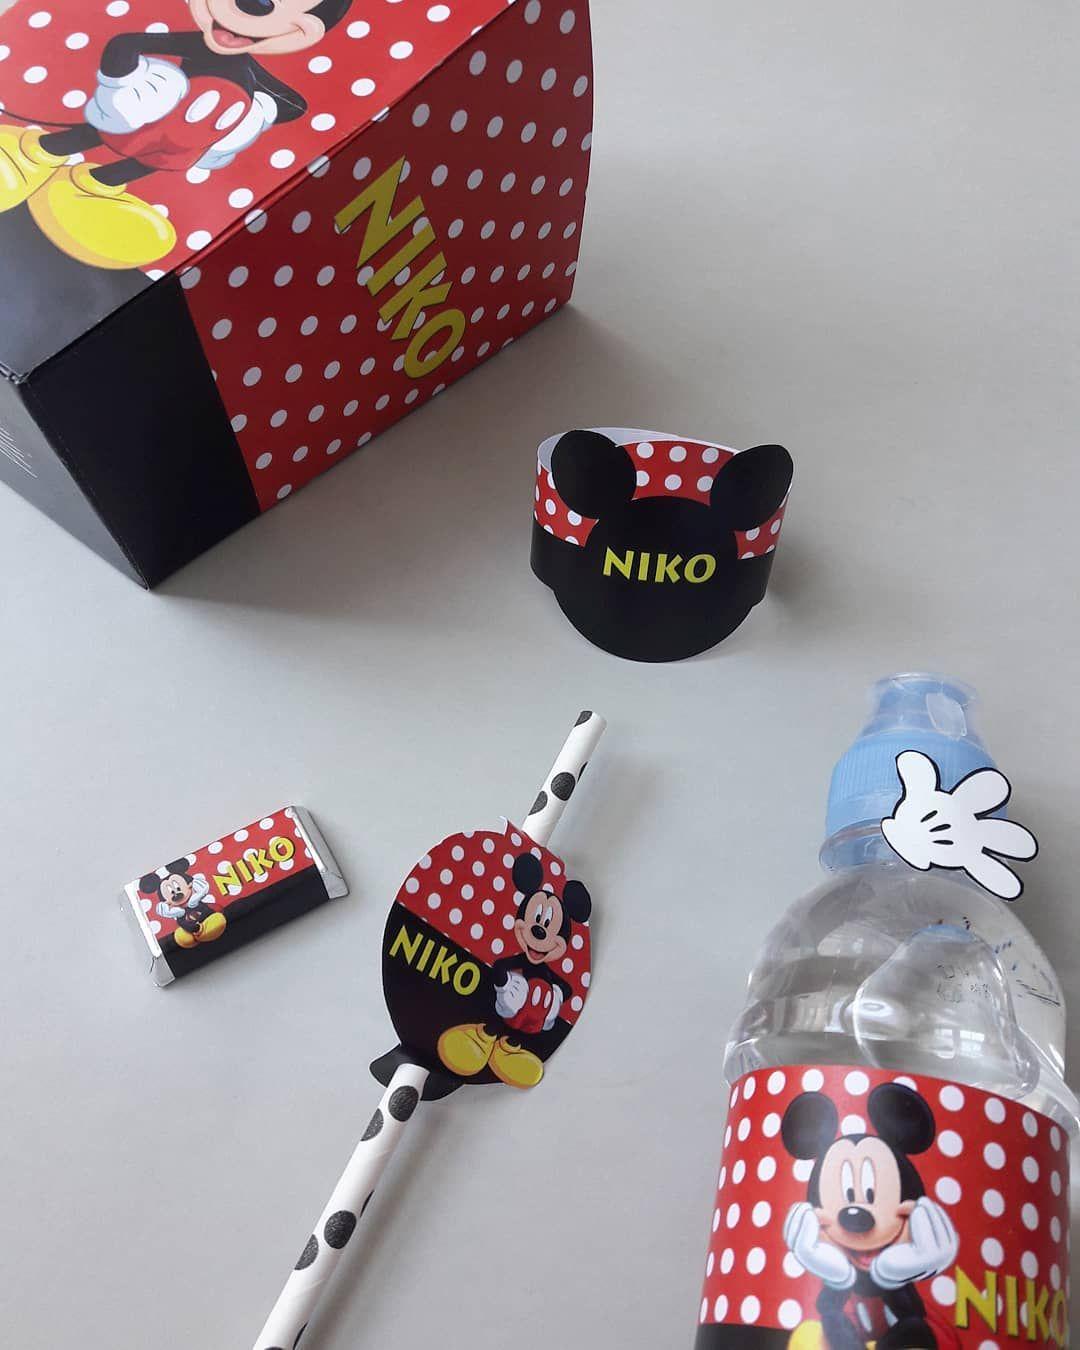 Mickey Mouse set za Niku 🍿 • [ENG]: Mickey Mouse birthday set for little Niko • •